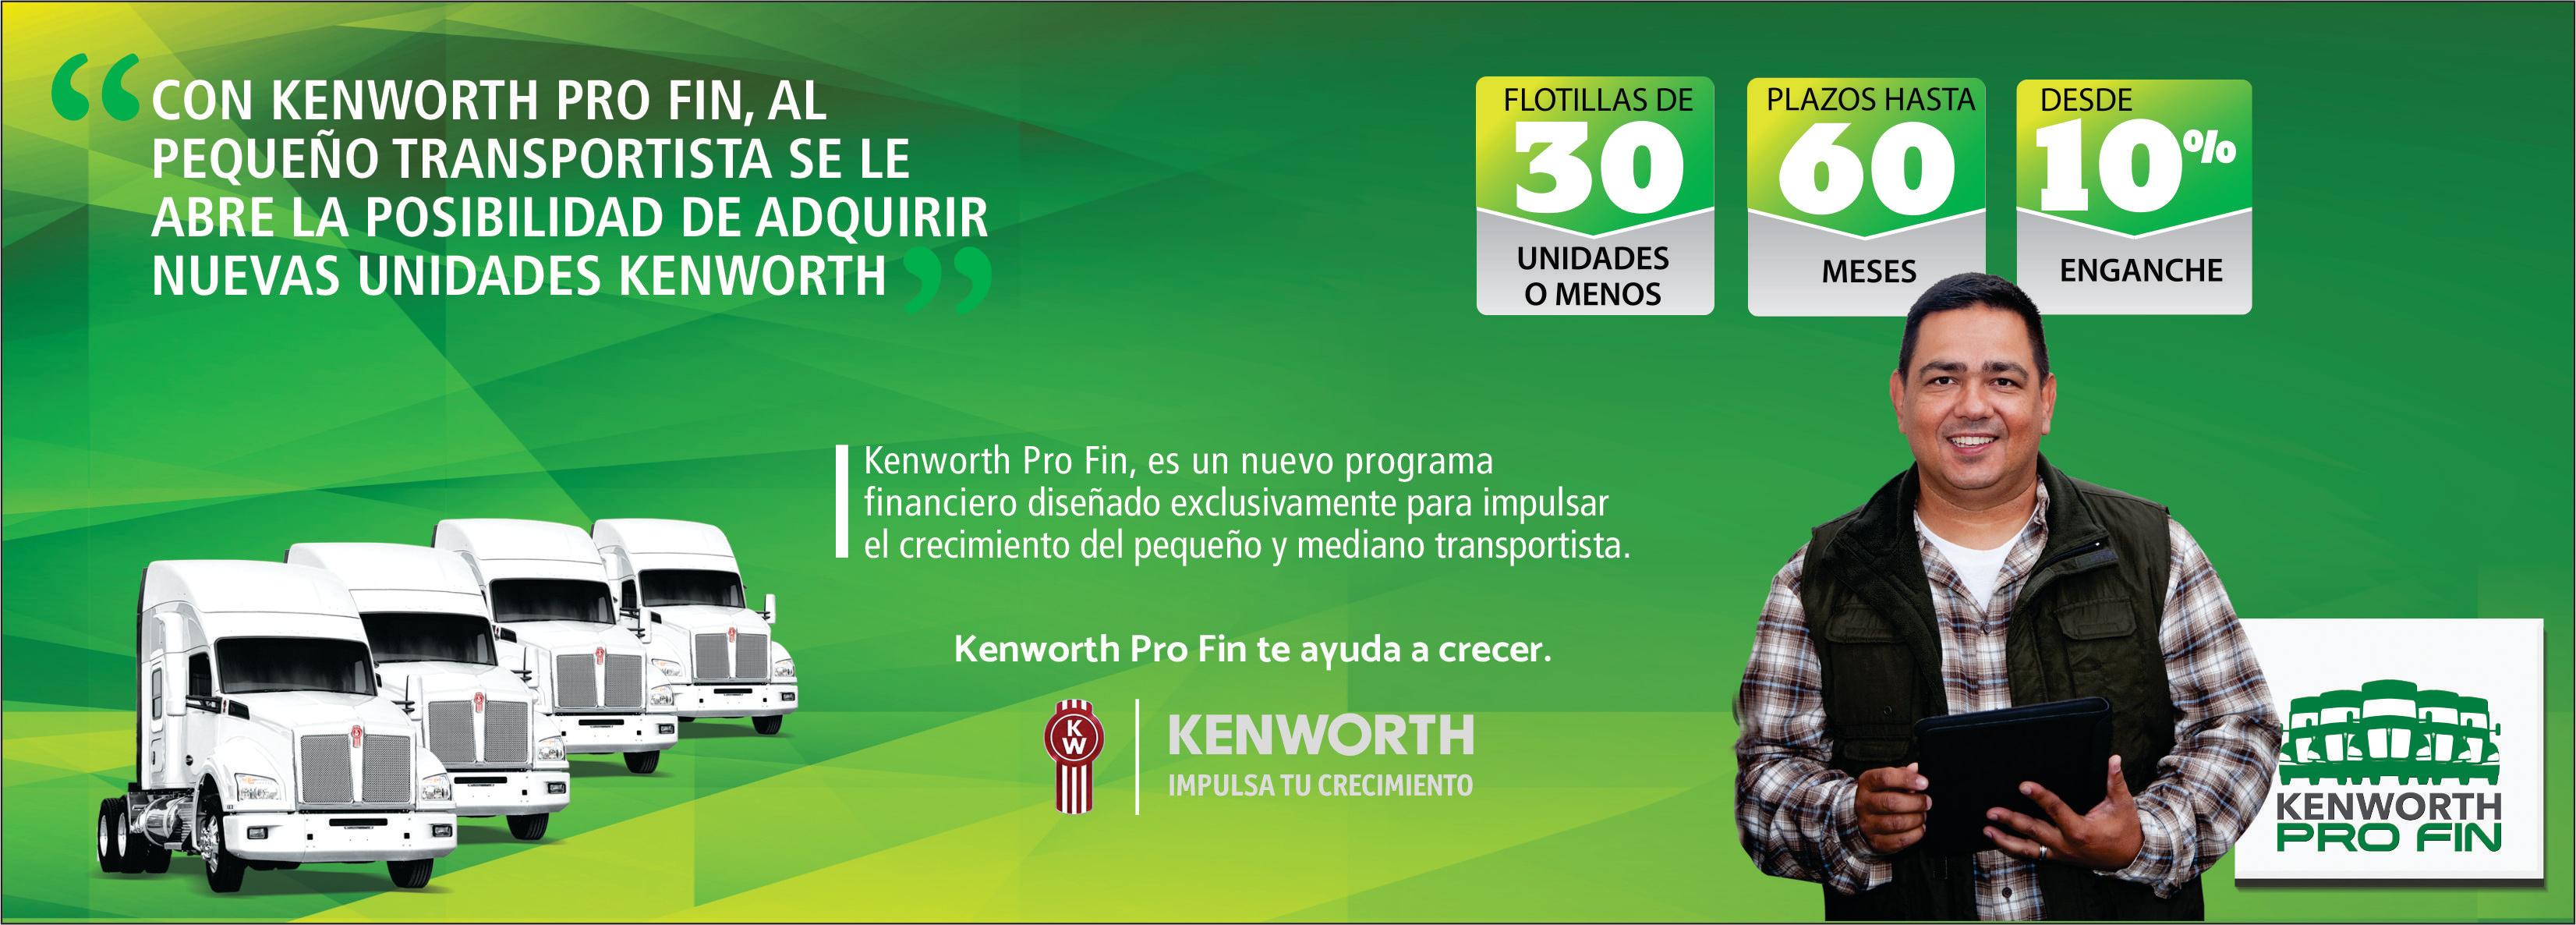 Kenworth Pro Fin